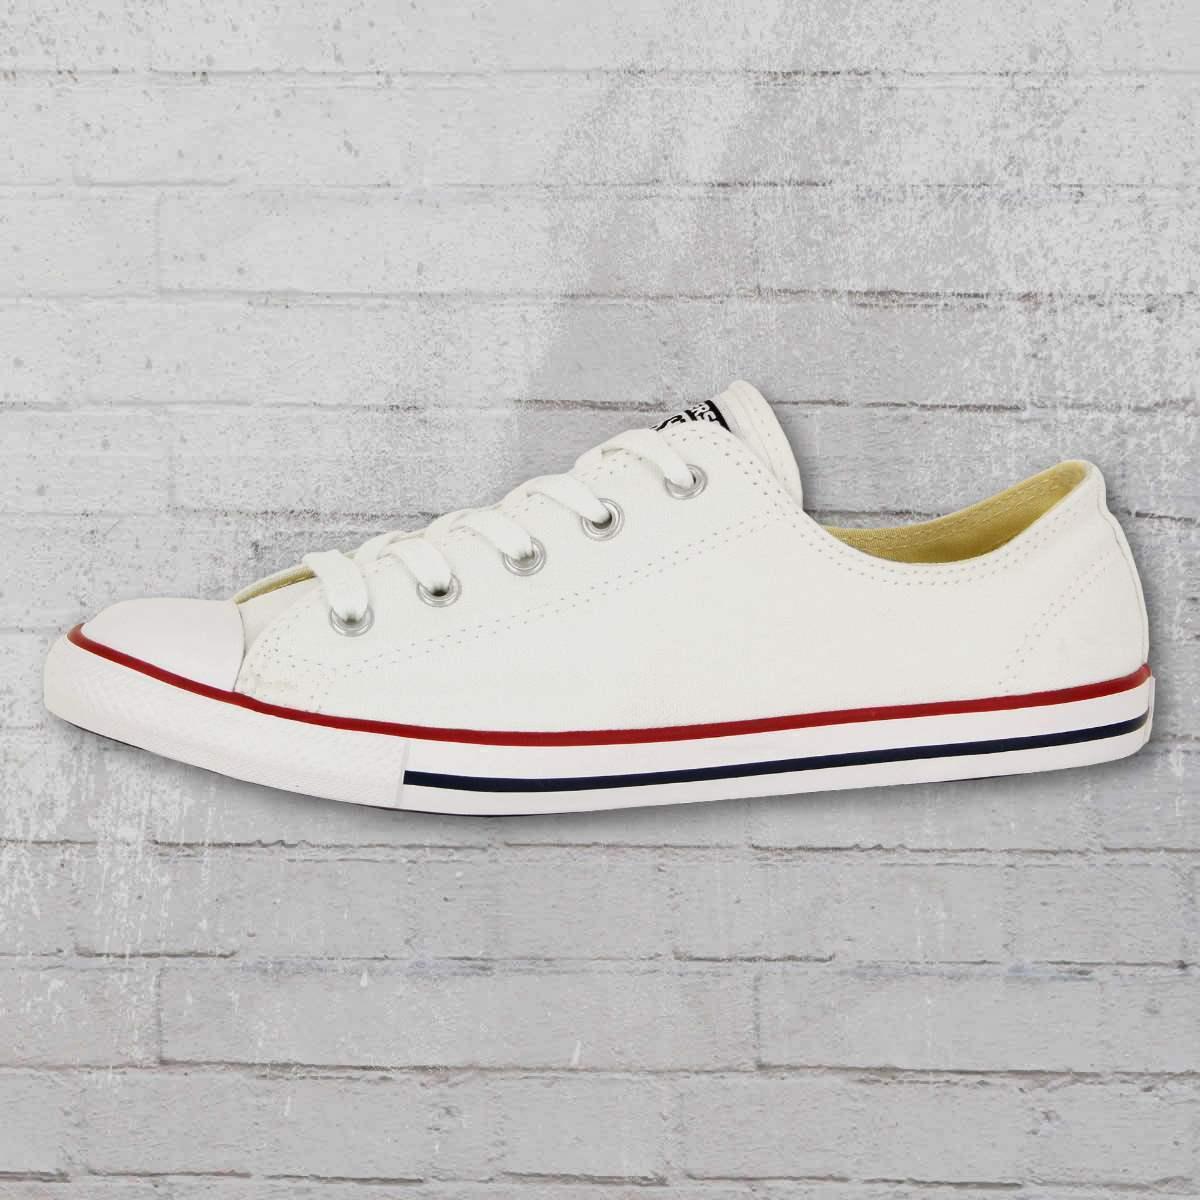 Converse Chucks Low Womens shoes CT Dainty Ox White Women Sneakers Flat Sole